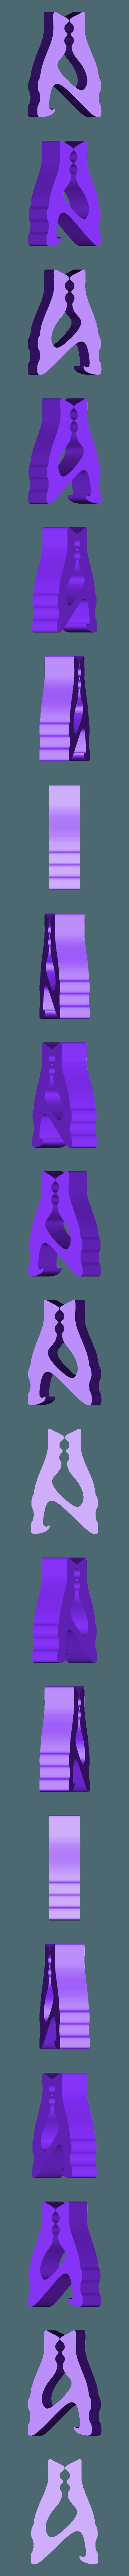 JG_filament_clip_strong.stl Download free STL file 'Use as you want' Filament Clip • 3D print template, c47